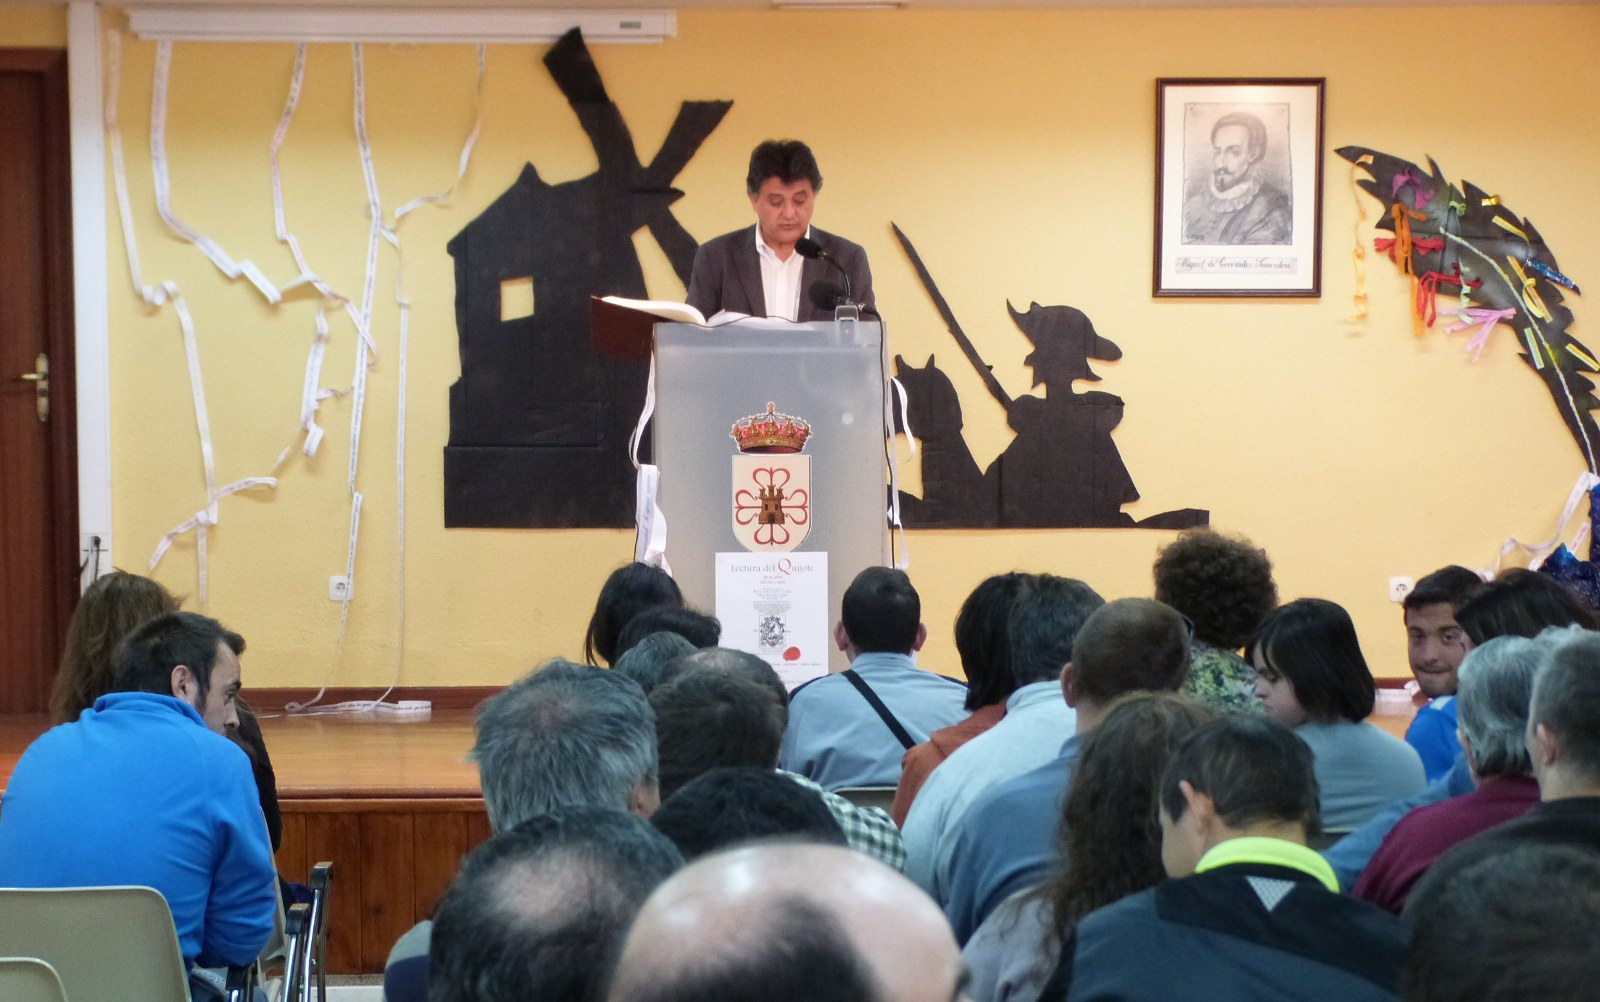 El alcalde y la concejal de Cultura inician la lectura pública de la segunda parte de 'El Quijote'